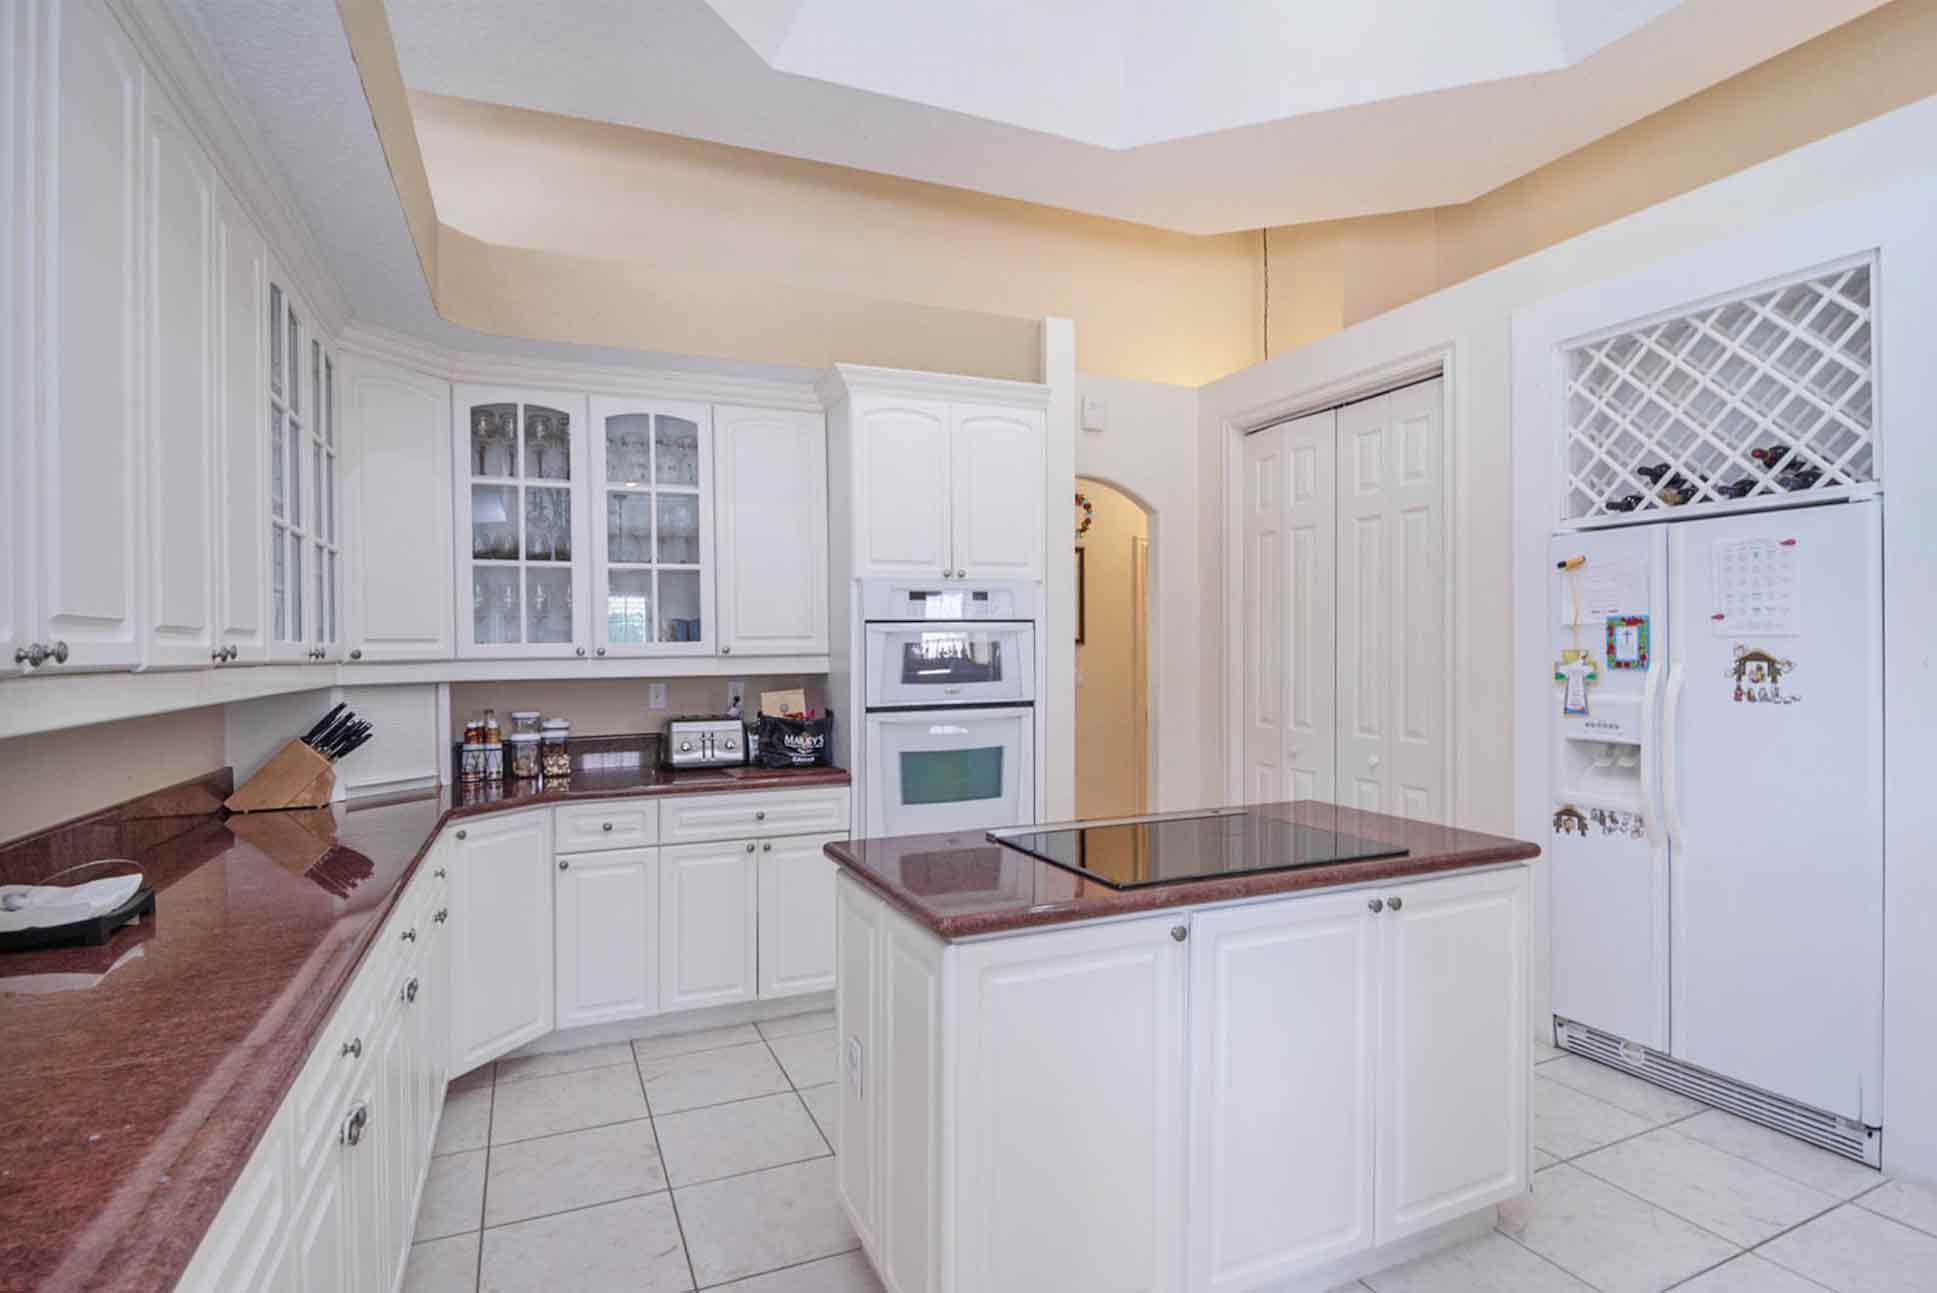 9900-the-falls-kitchen